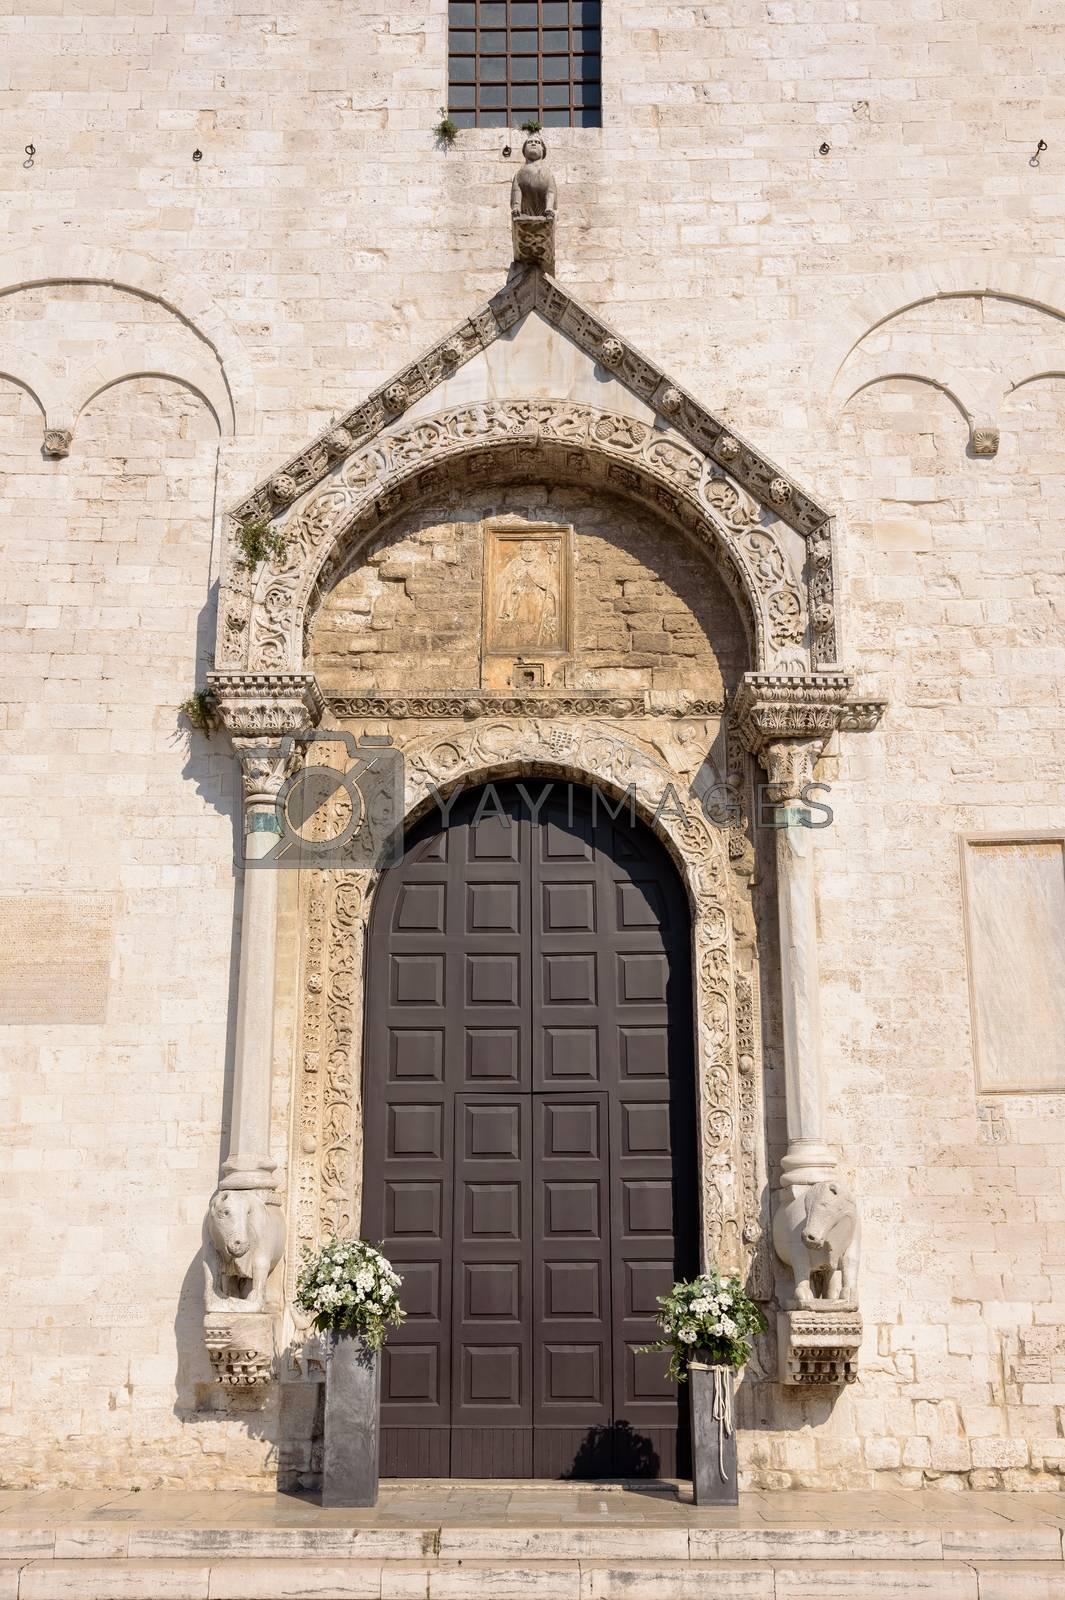 Decorated entrance to the Basilica of Saint Nicholas in Bari, Alupia, Italy